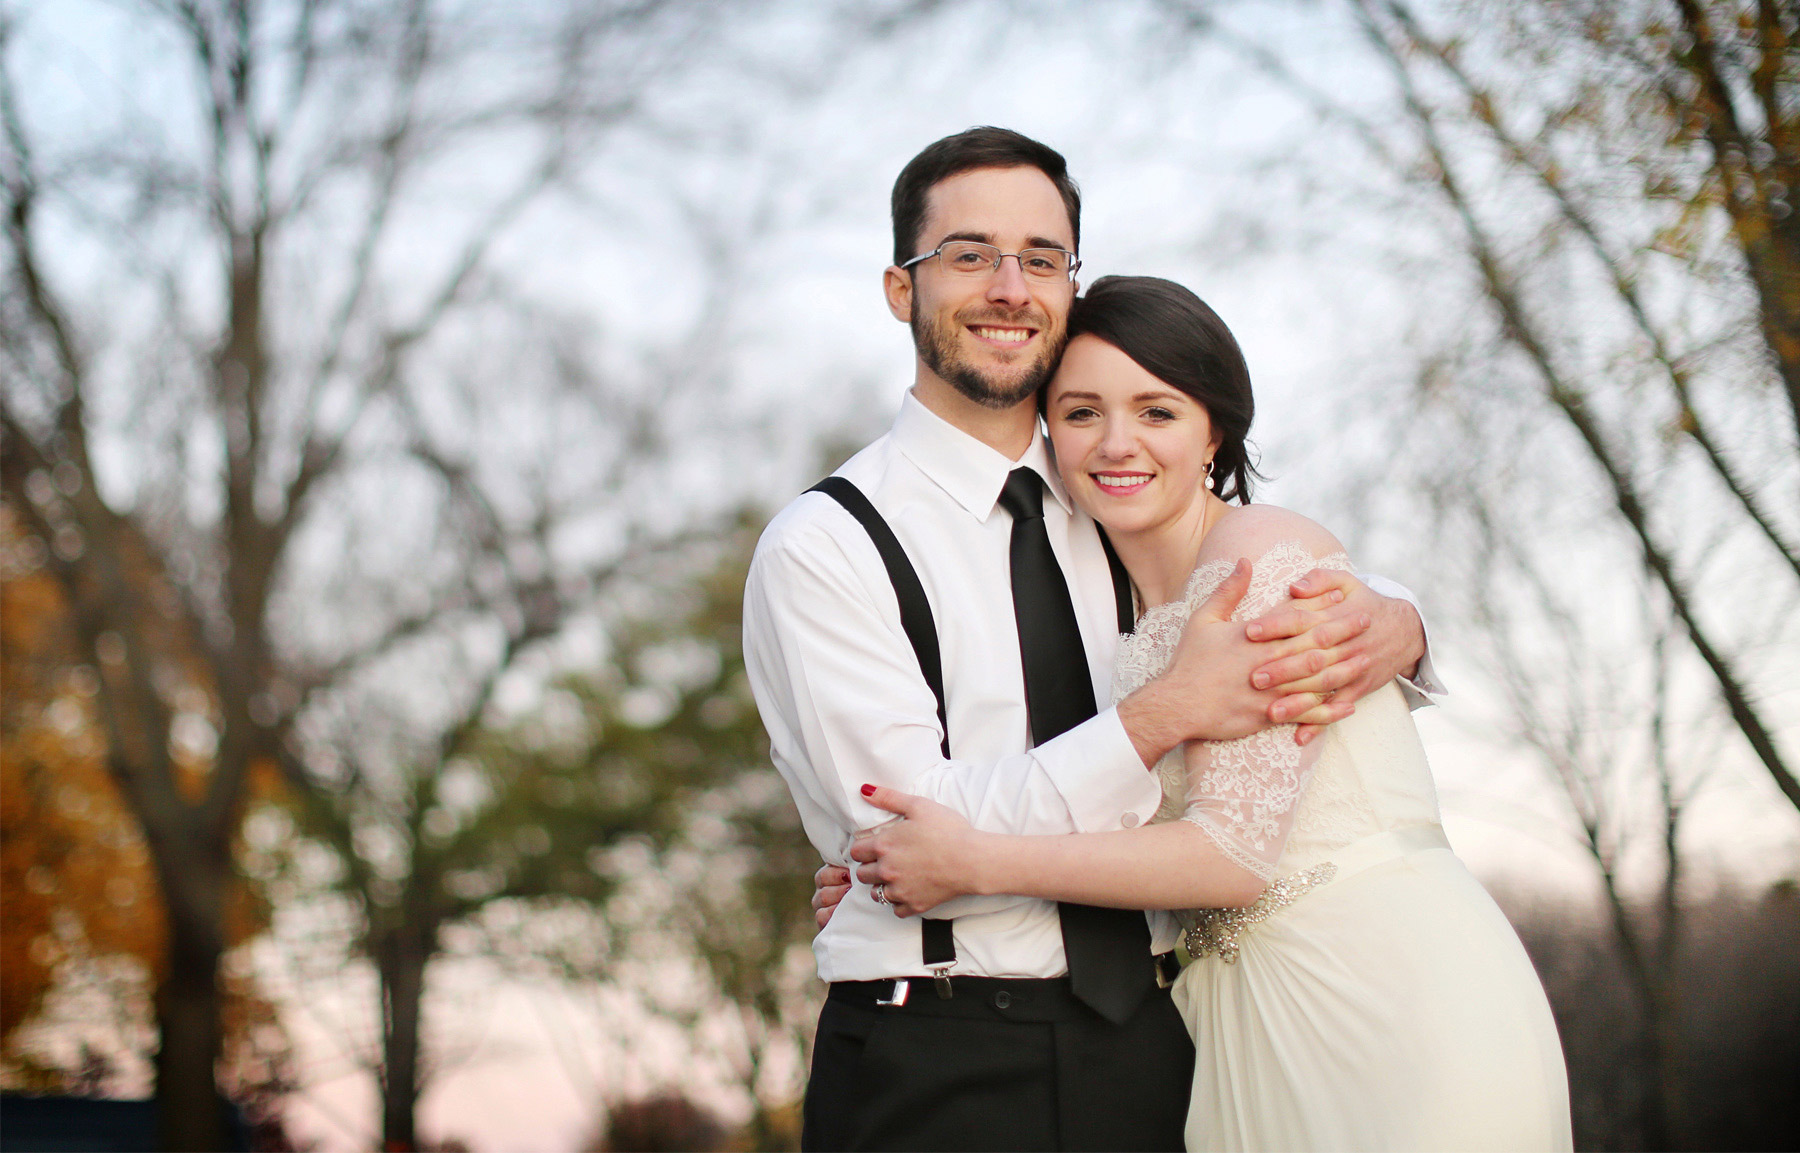 13-Minneapolis-Minnesota-Wedding-Photography-by-Vick-Photography-Autumn-Sarah-and-Patrick.jpg